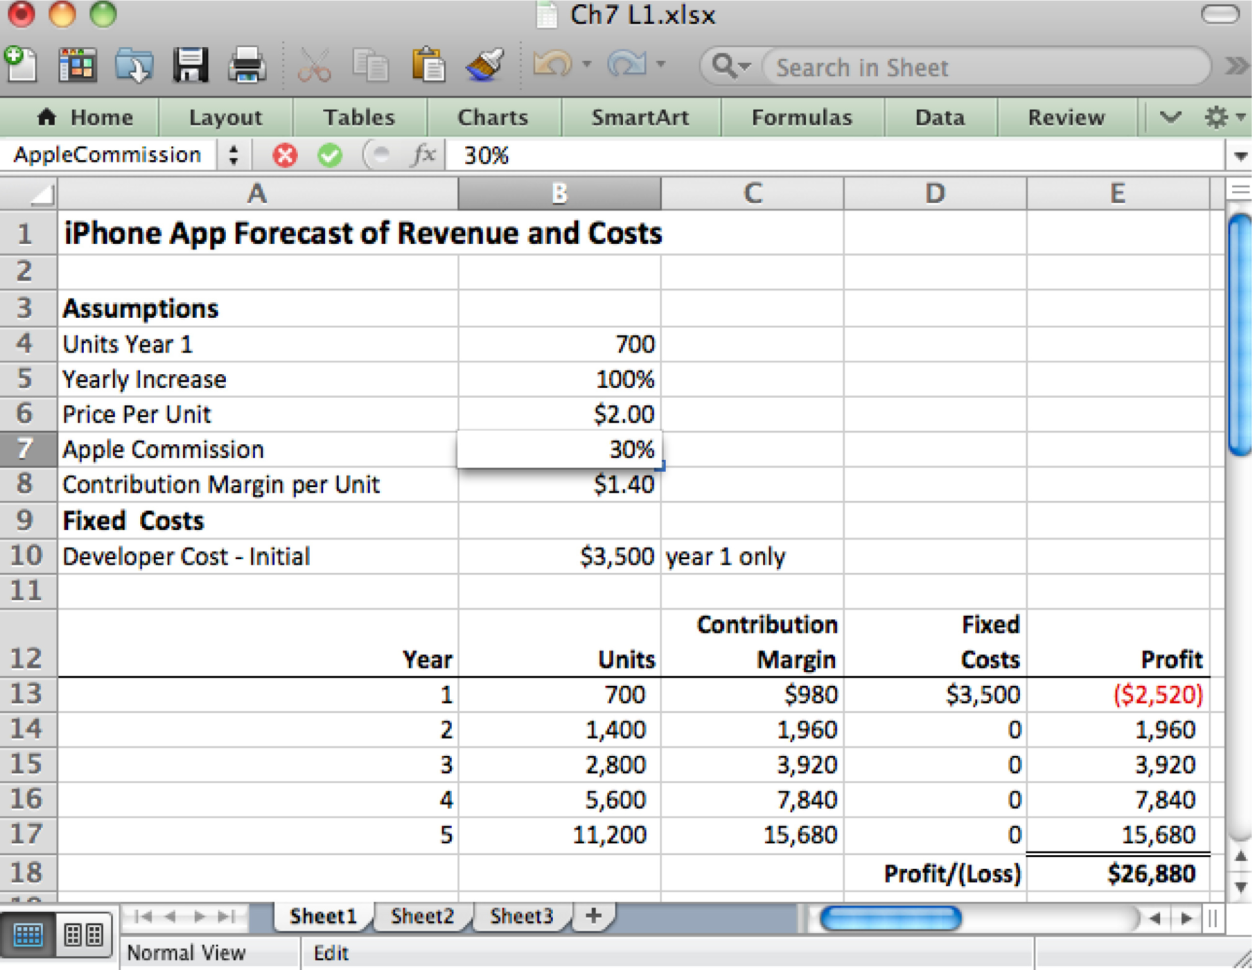 Rental Property Analysis Spreadsheet | Spreadsheet Collections Intended For Rental Property Analysis Spreadsheet